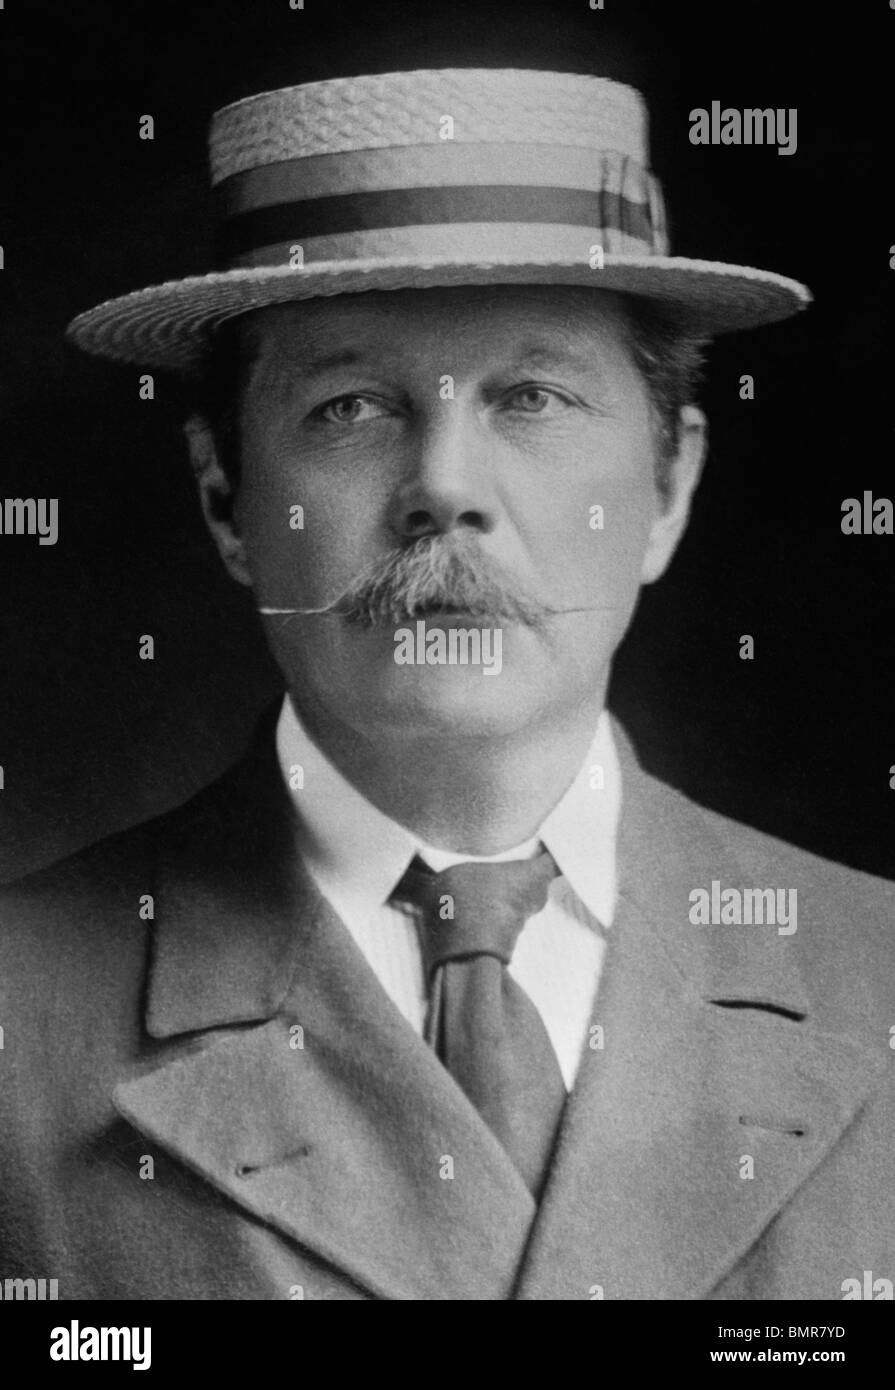 Portrait photo c1900 of Scottish author Sir Arthur Conan Doyle (1859 - 1930) - creator of fictional detective Sherlock - Stock Image